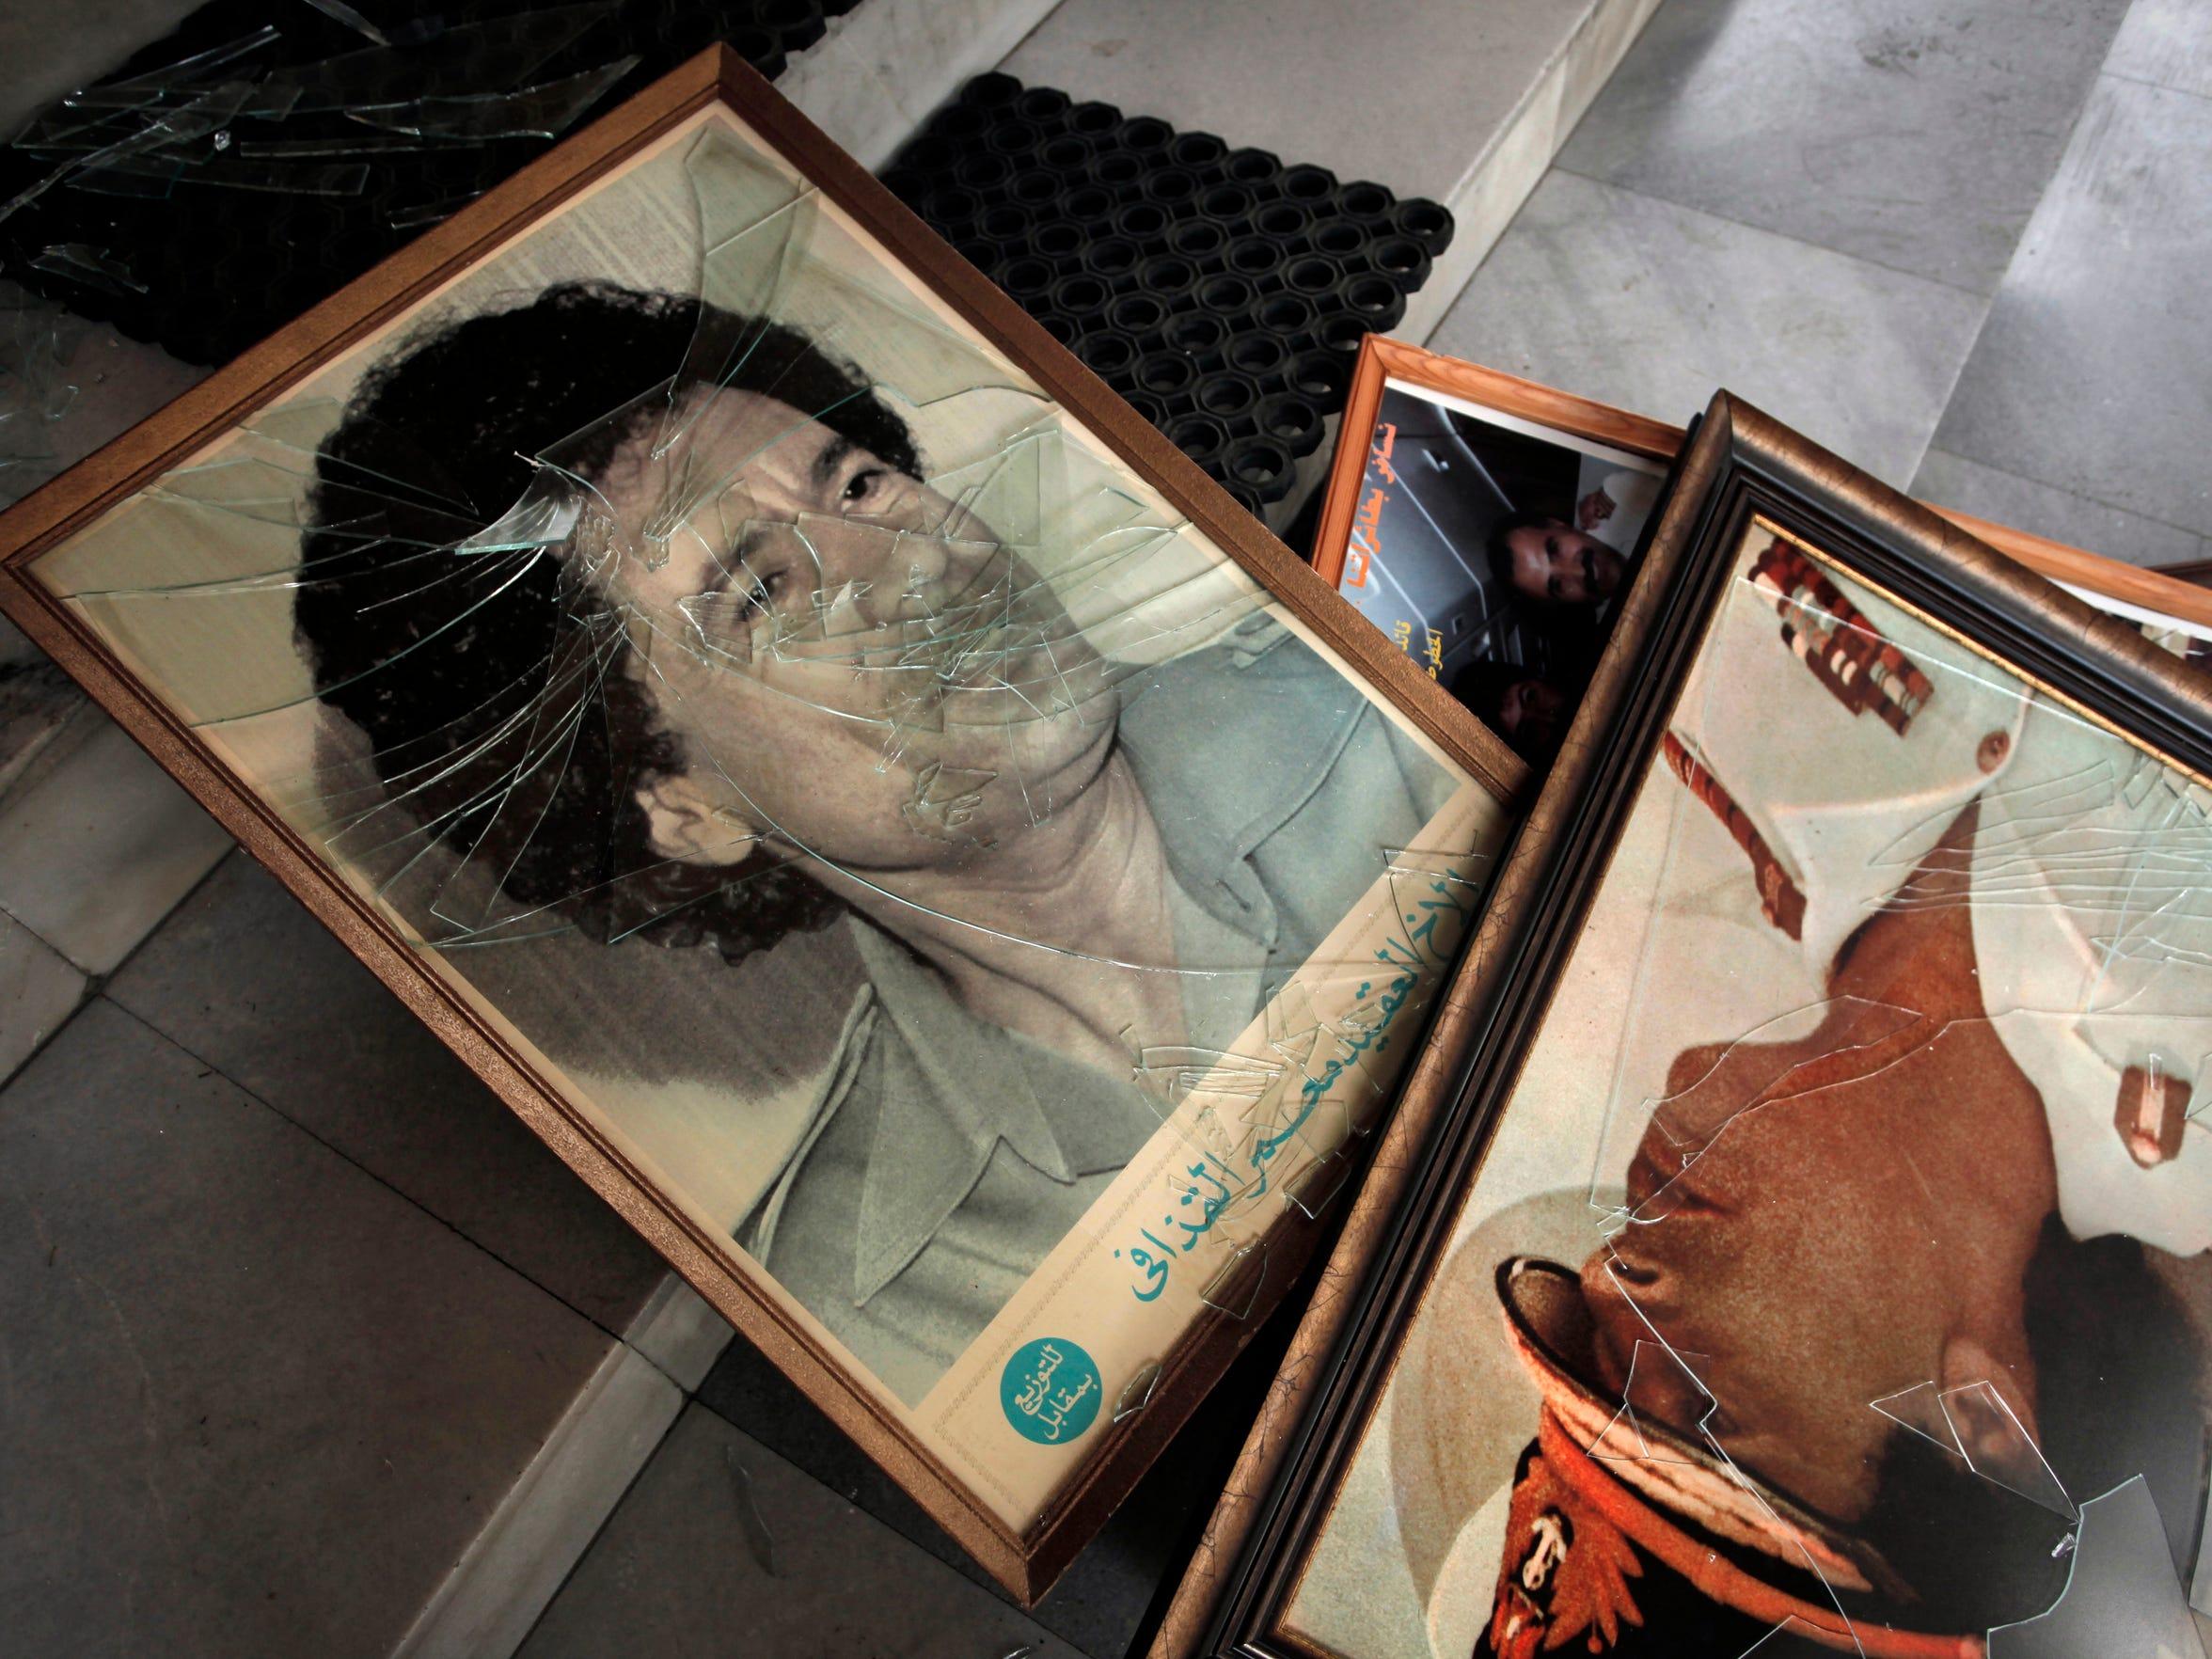 Broken portraits of Moammar Gadhafi seen at the Libyan